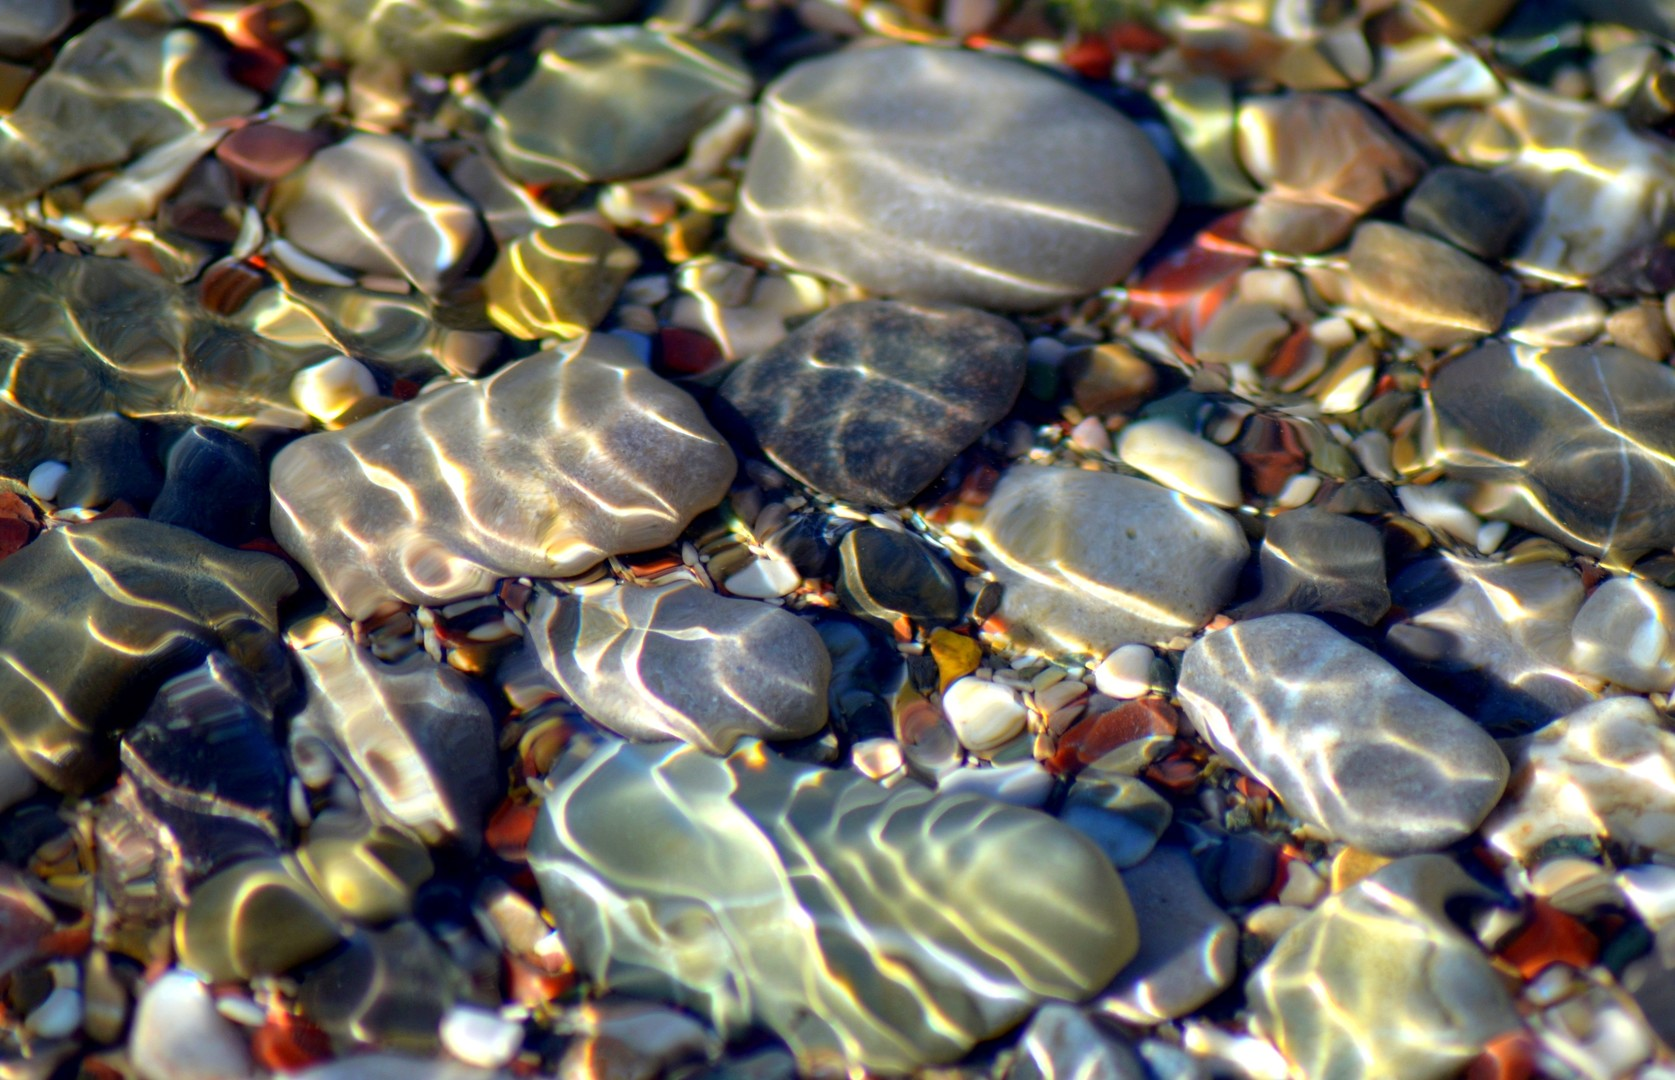 DSC 2722SF   Igra sunca vode i kamena